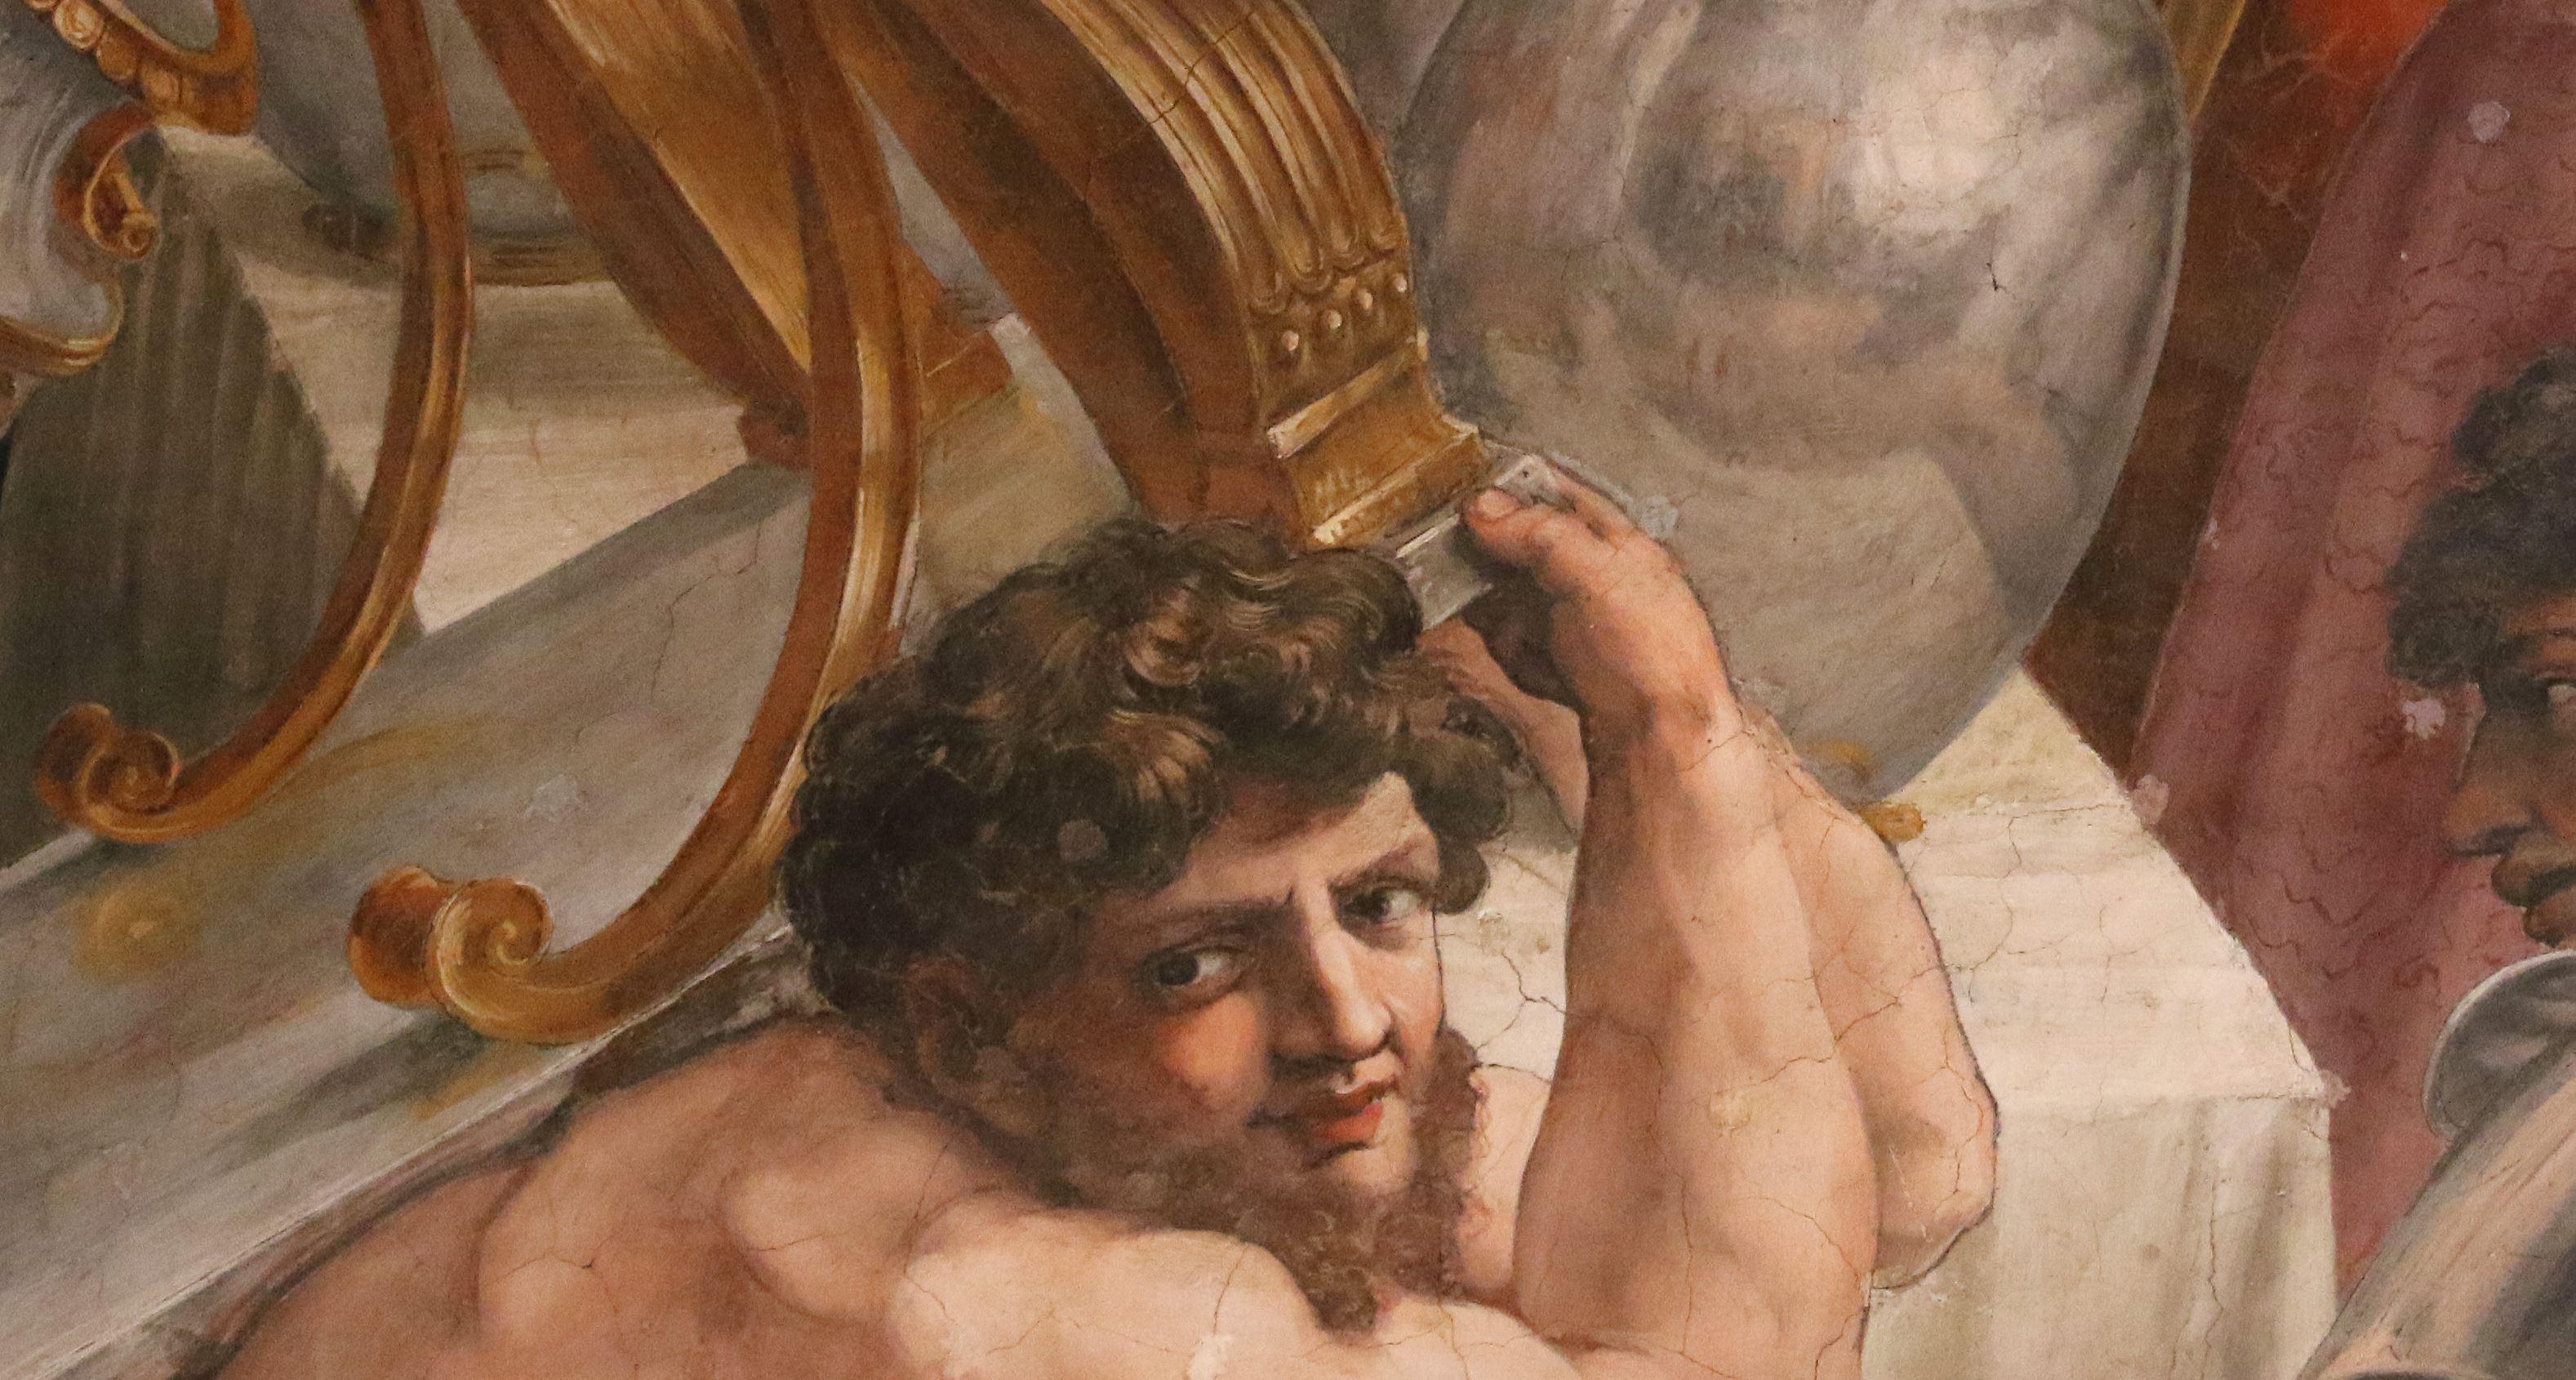 Raphel Couronnement de Charlemagne reflet vase zoom